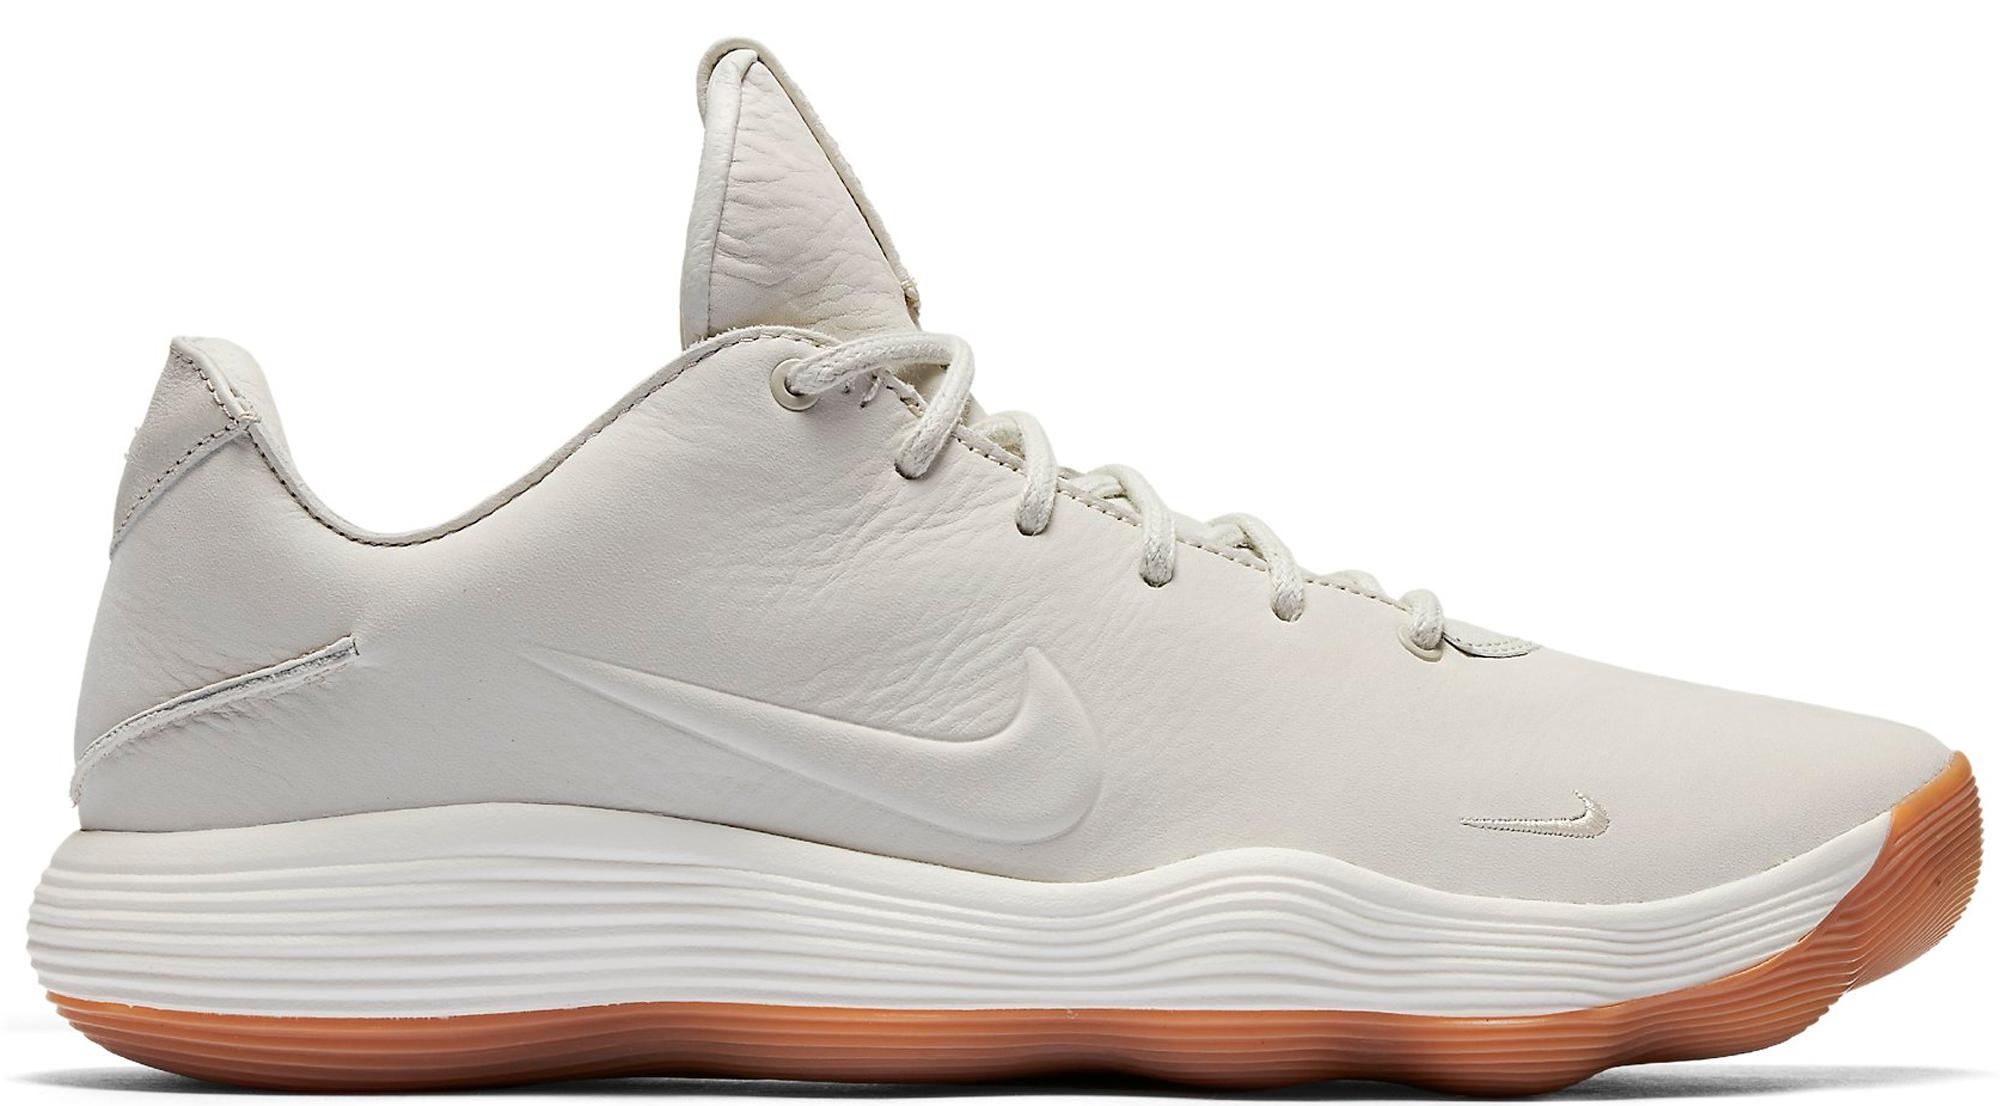 Nike Hyperdunk 2017 Low White Gum